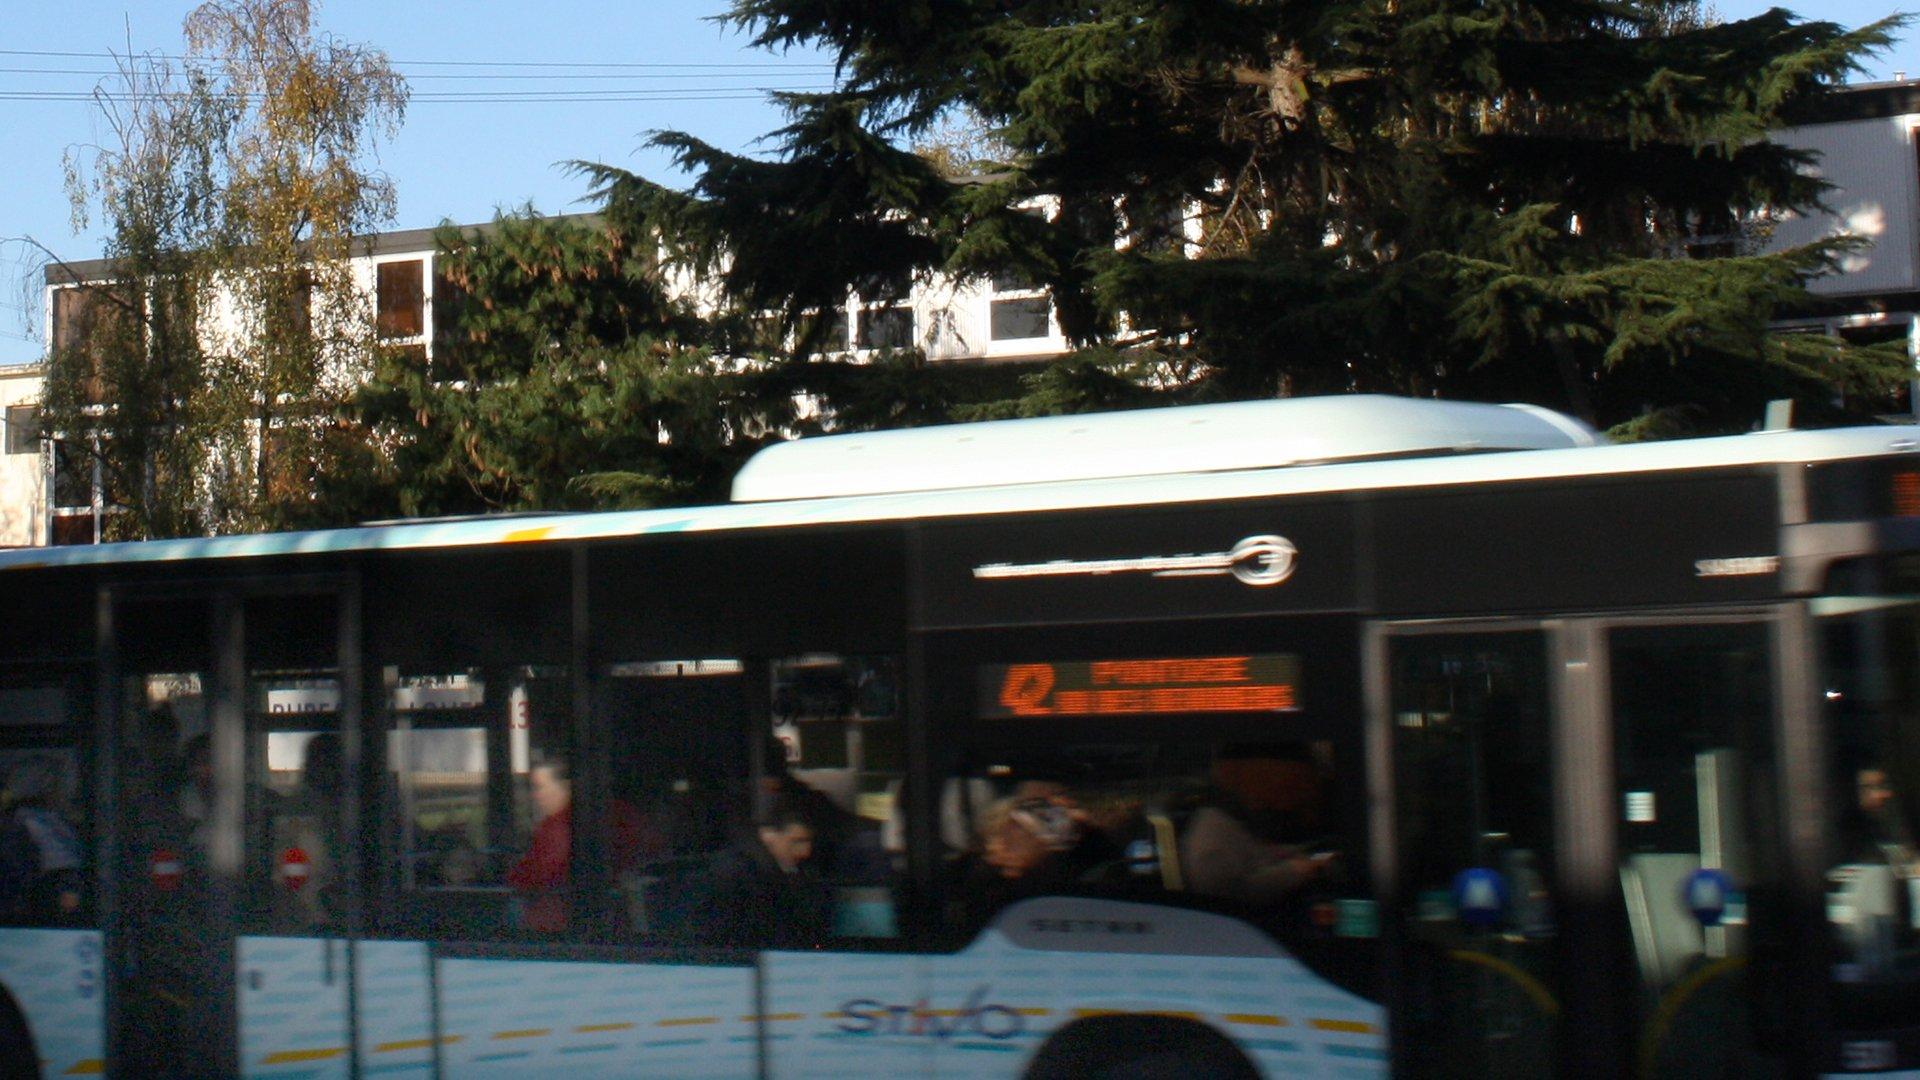 Bus Stivo 42 Cergy Pontoise Accès Djem Formation transports en commun